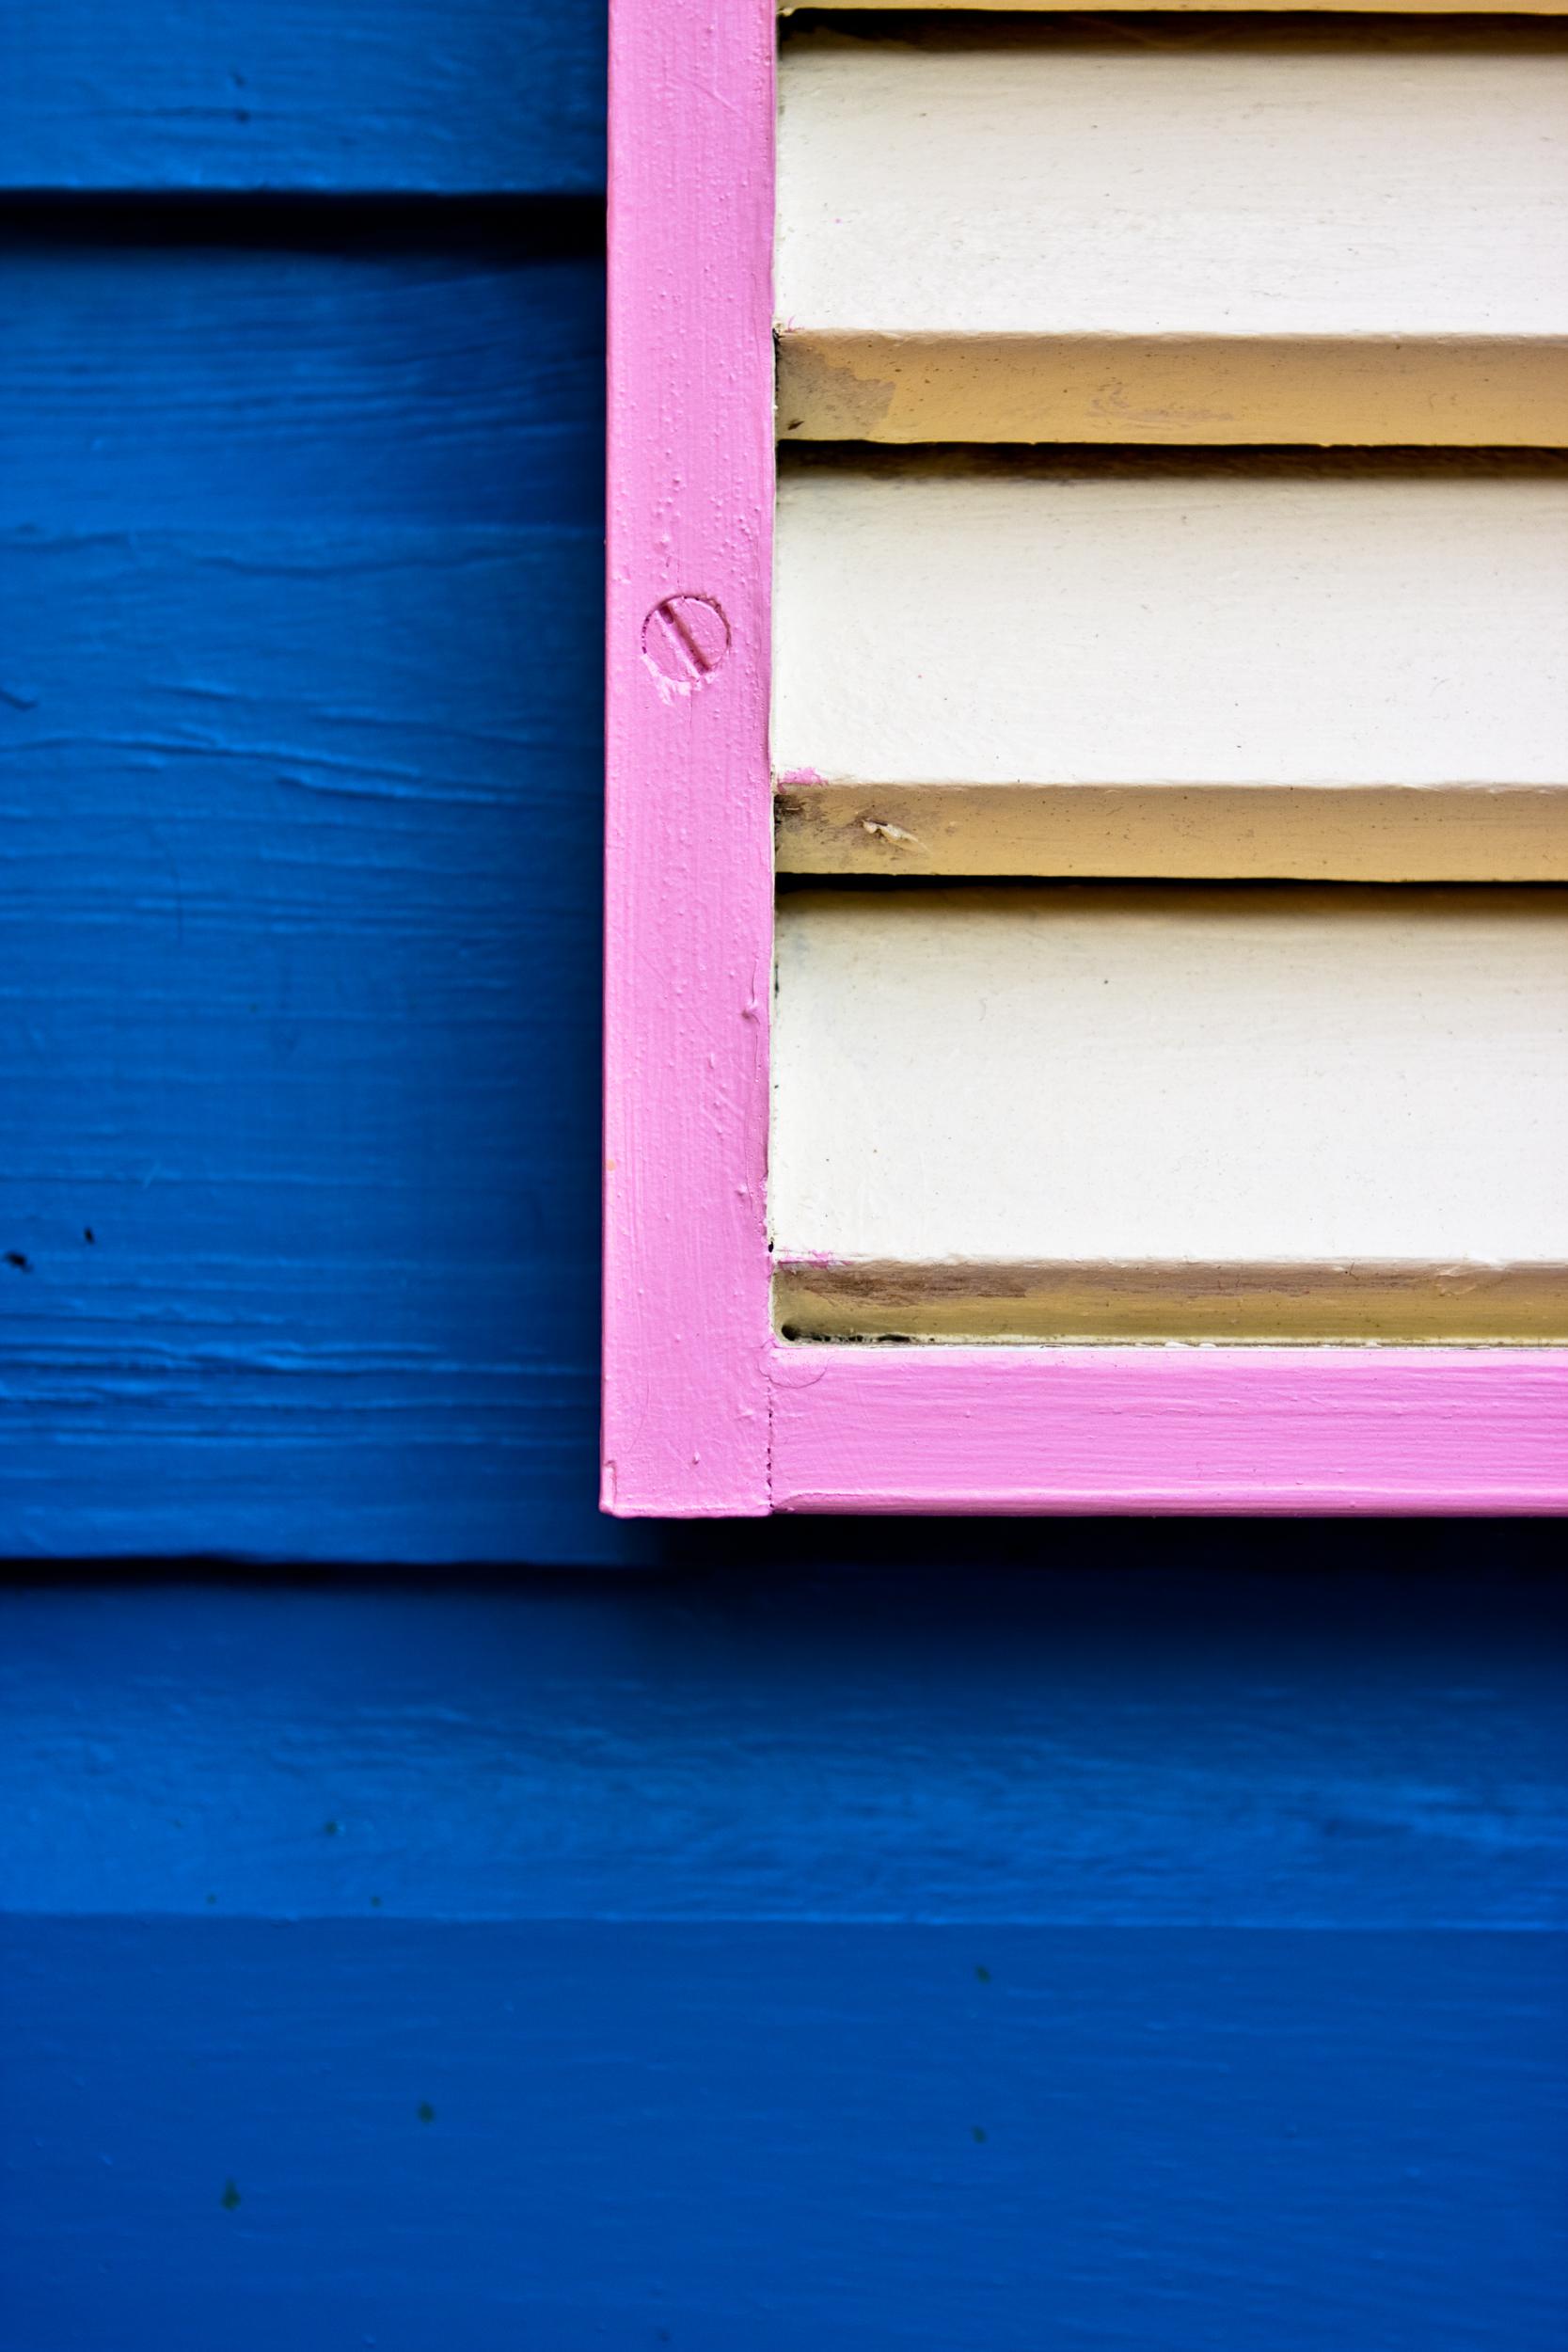 Detail image of pink trim set against blue wood siding.